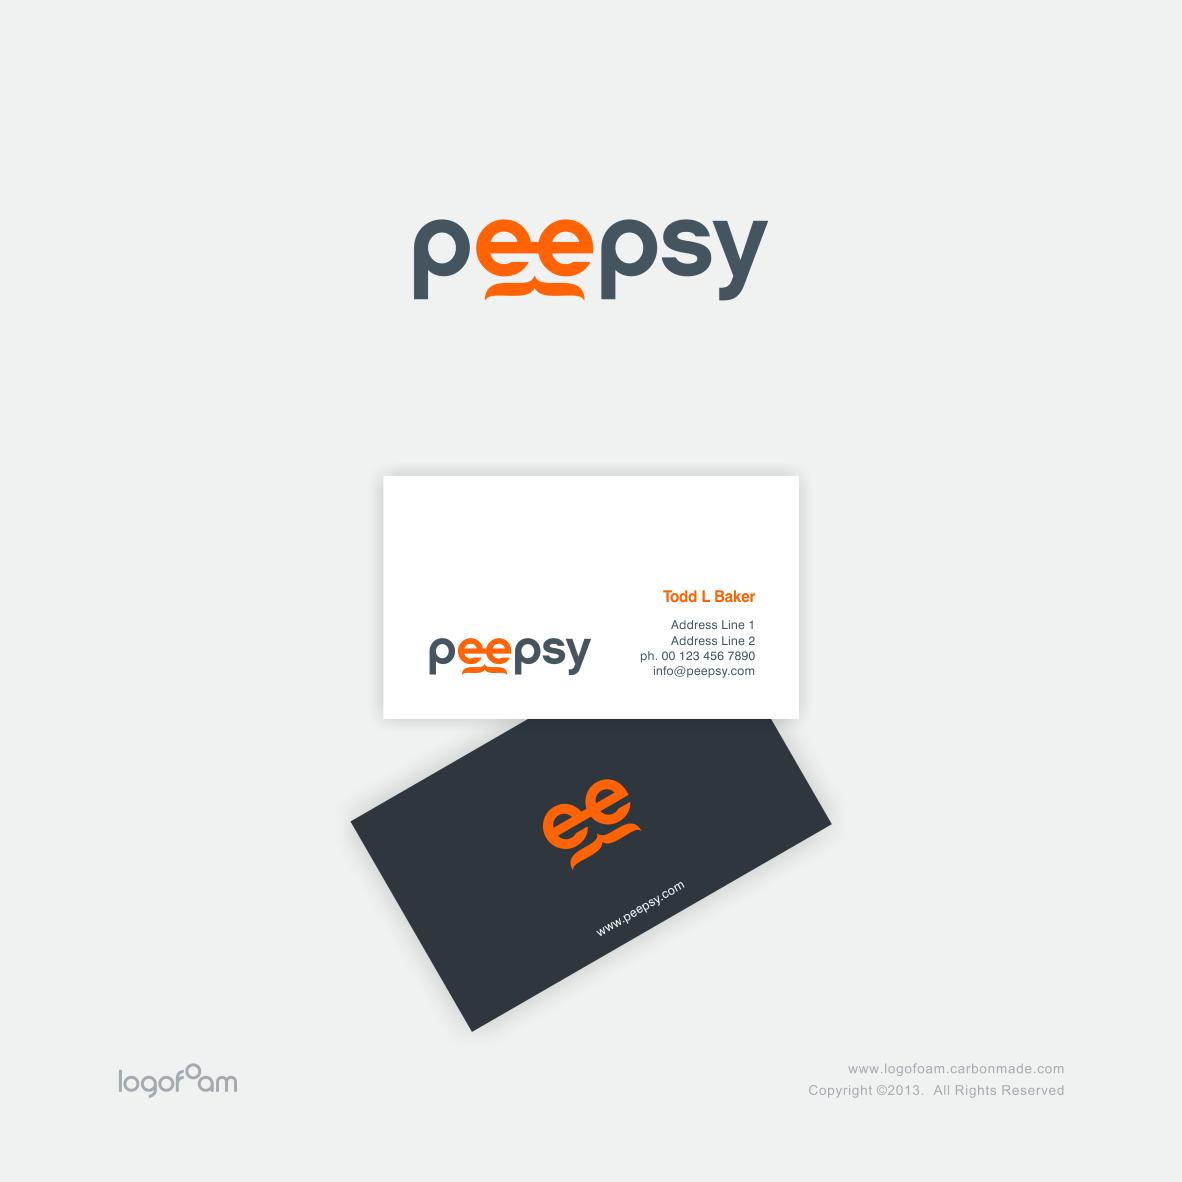 Create the next logo for Peepsy